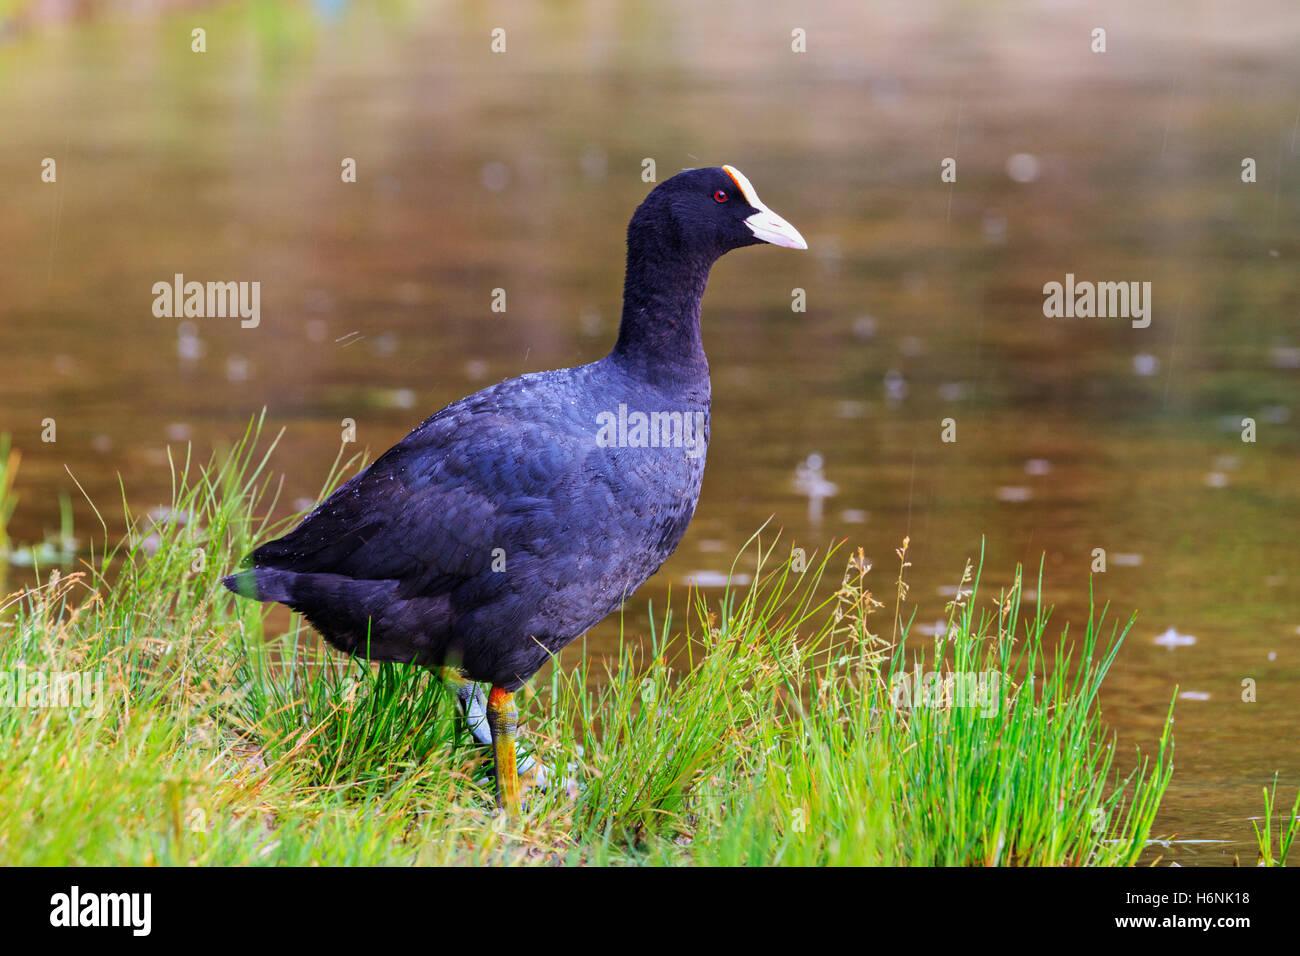 Black bird in a green grass under the rain - Stock Image